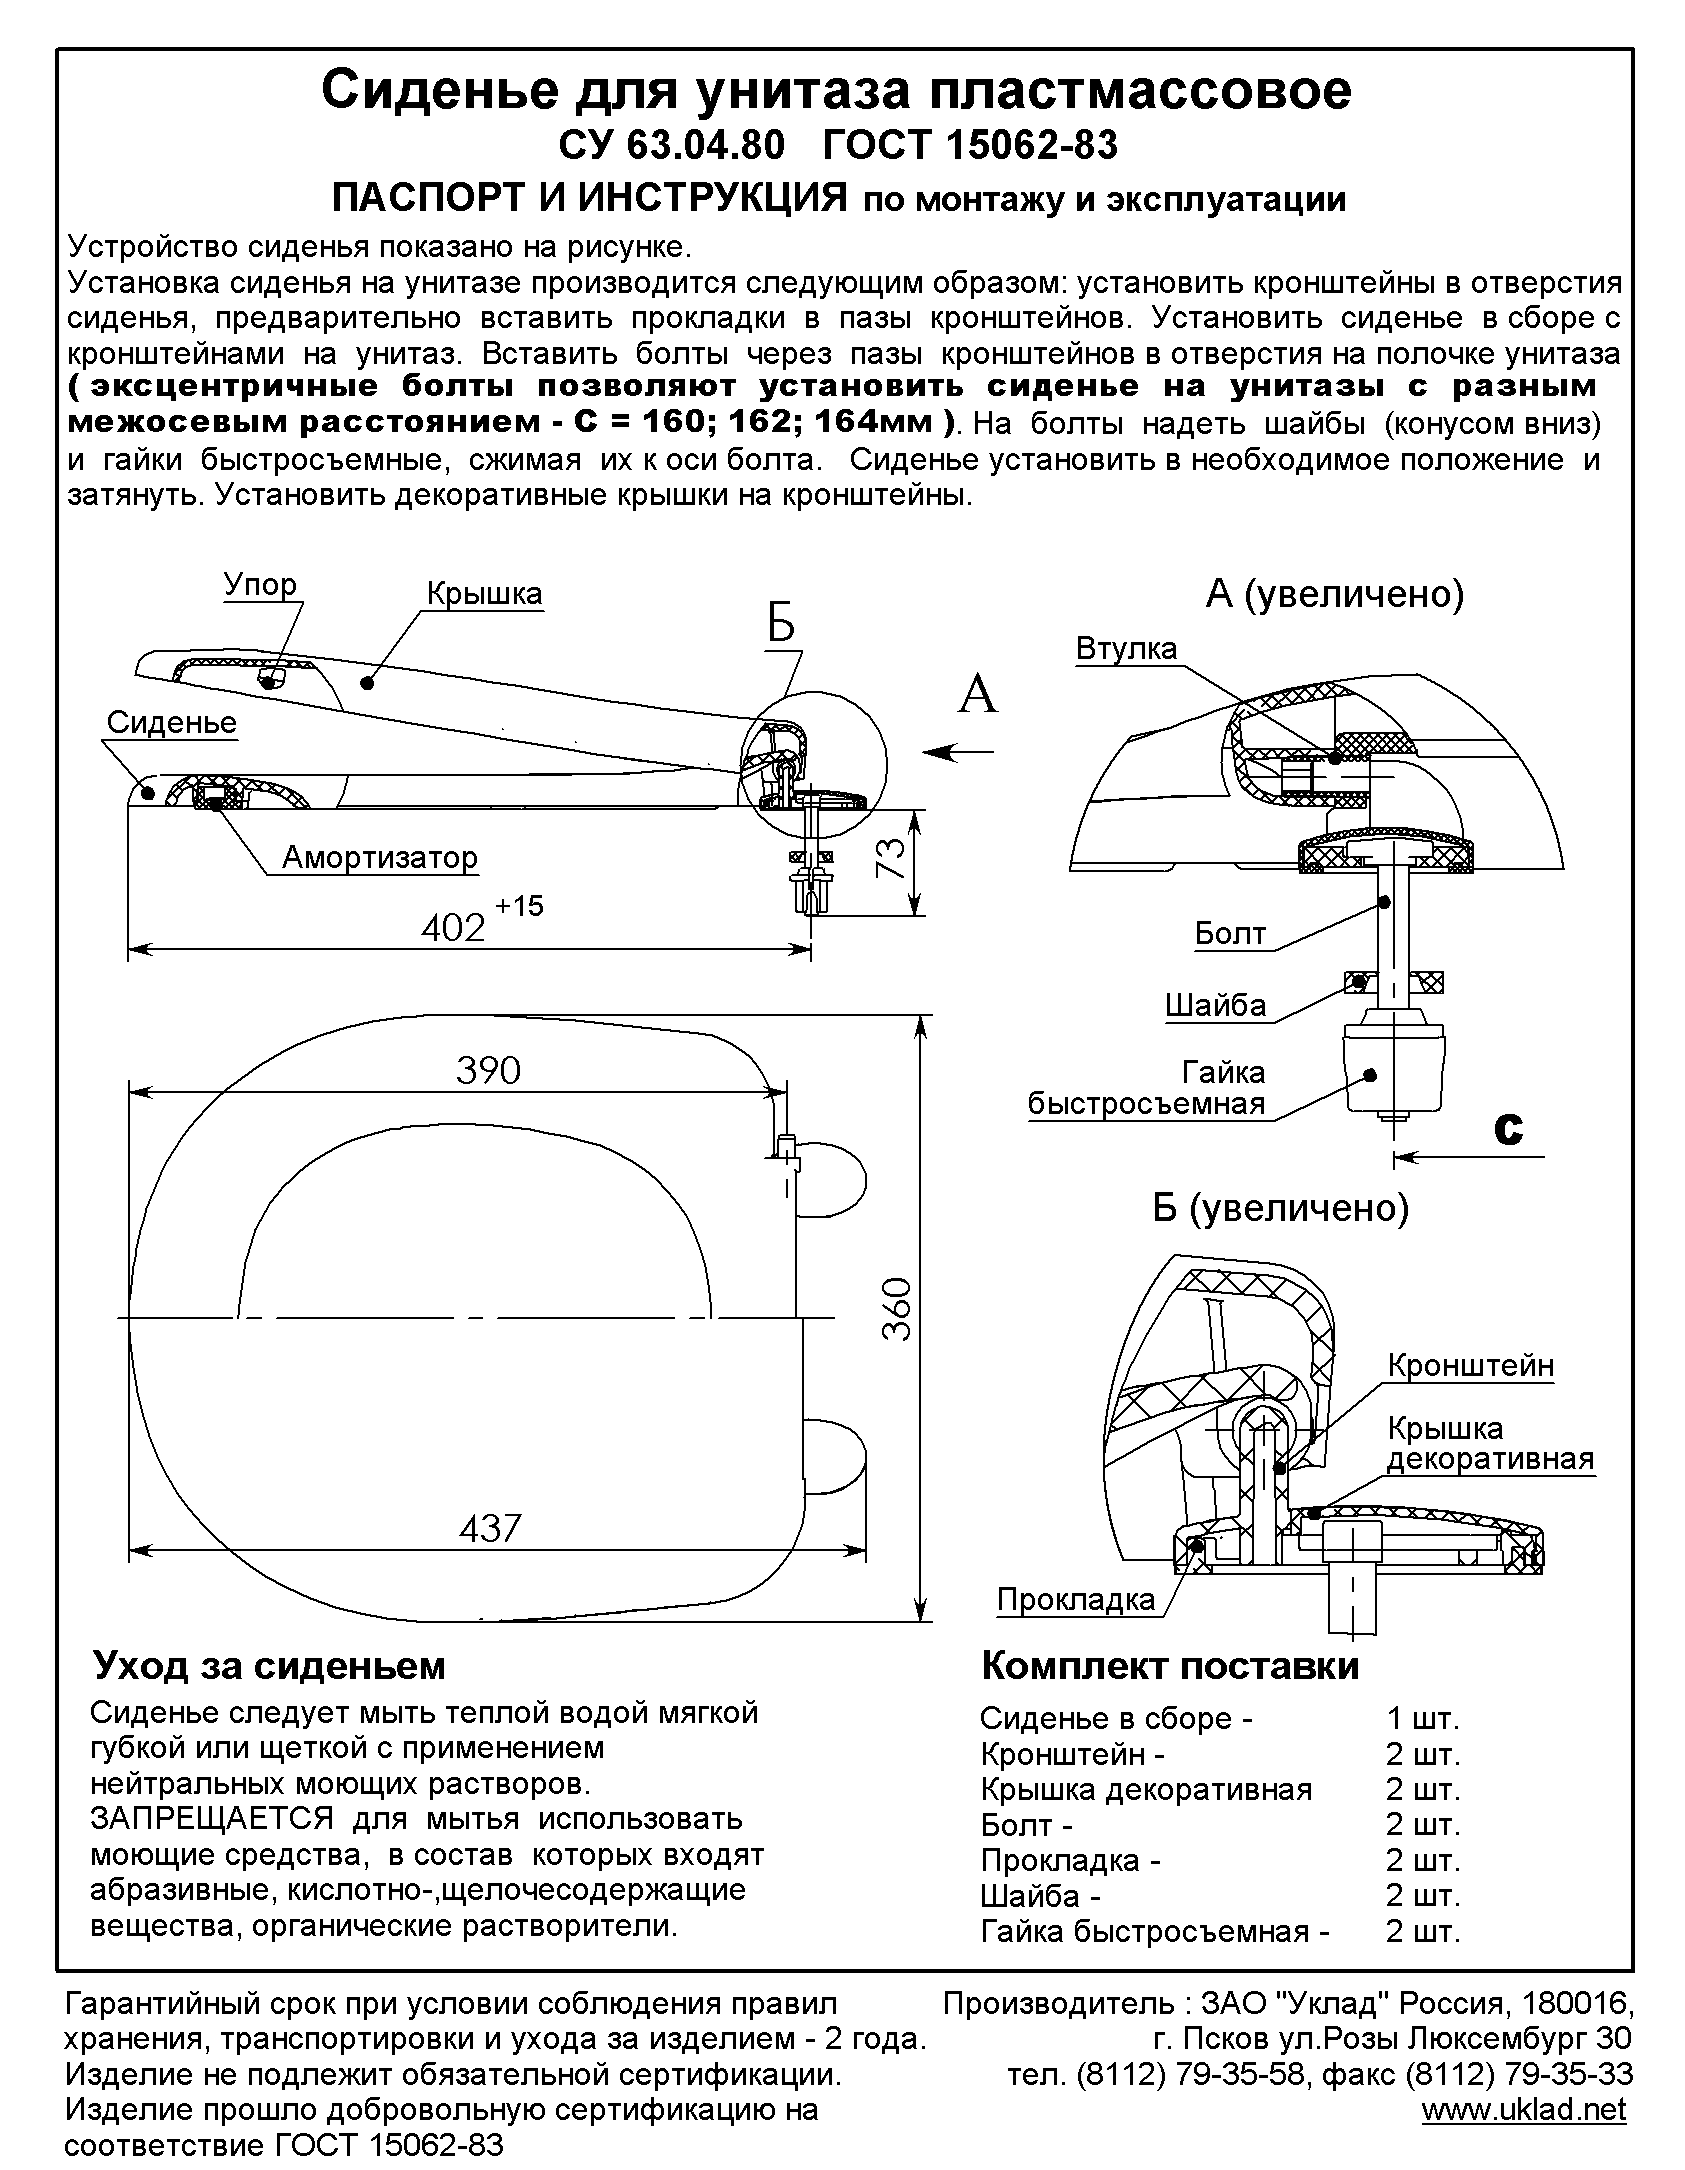 Кафиол - инструкция